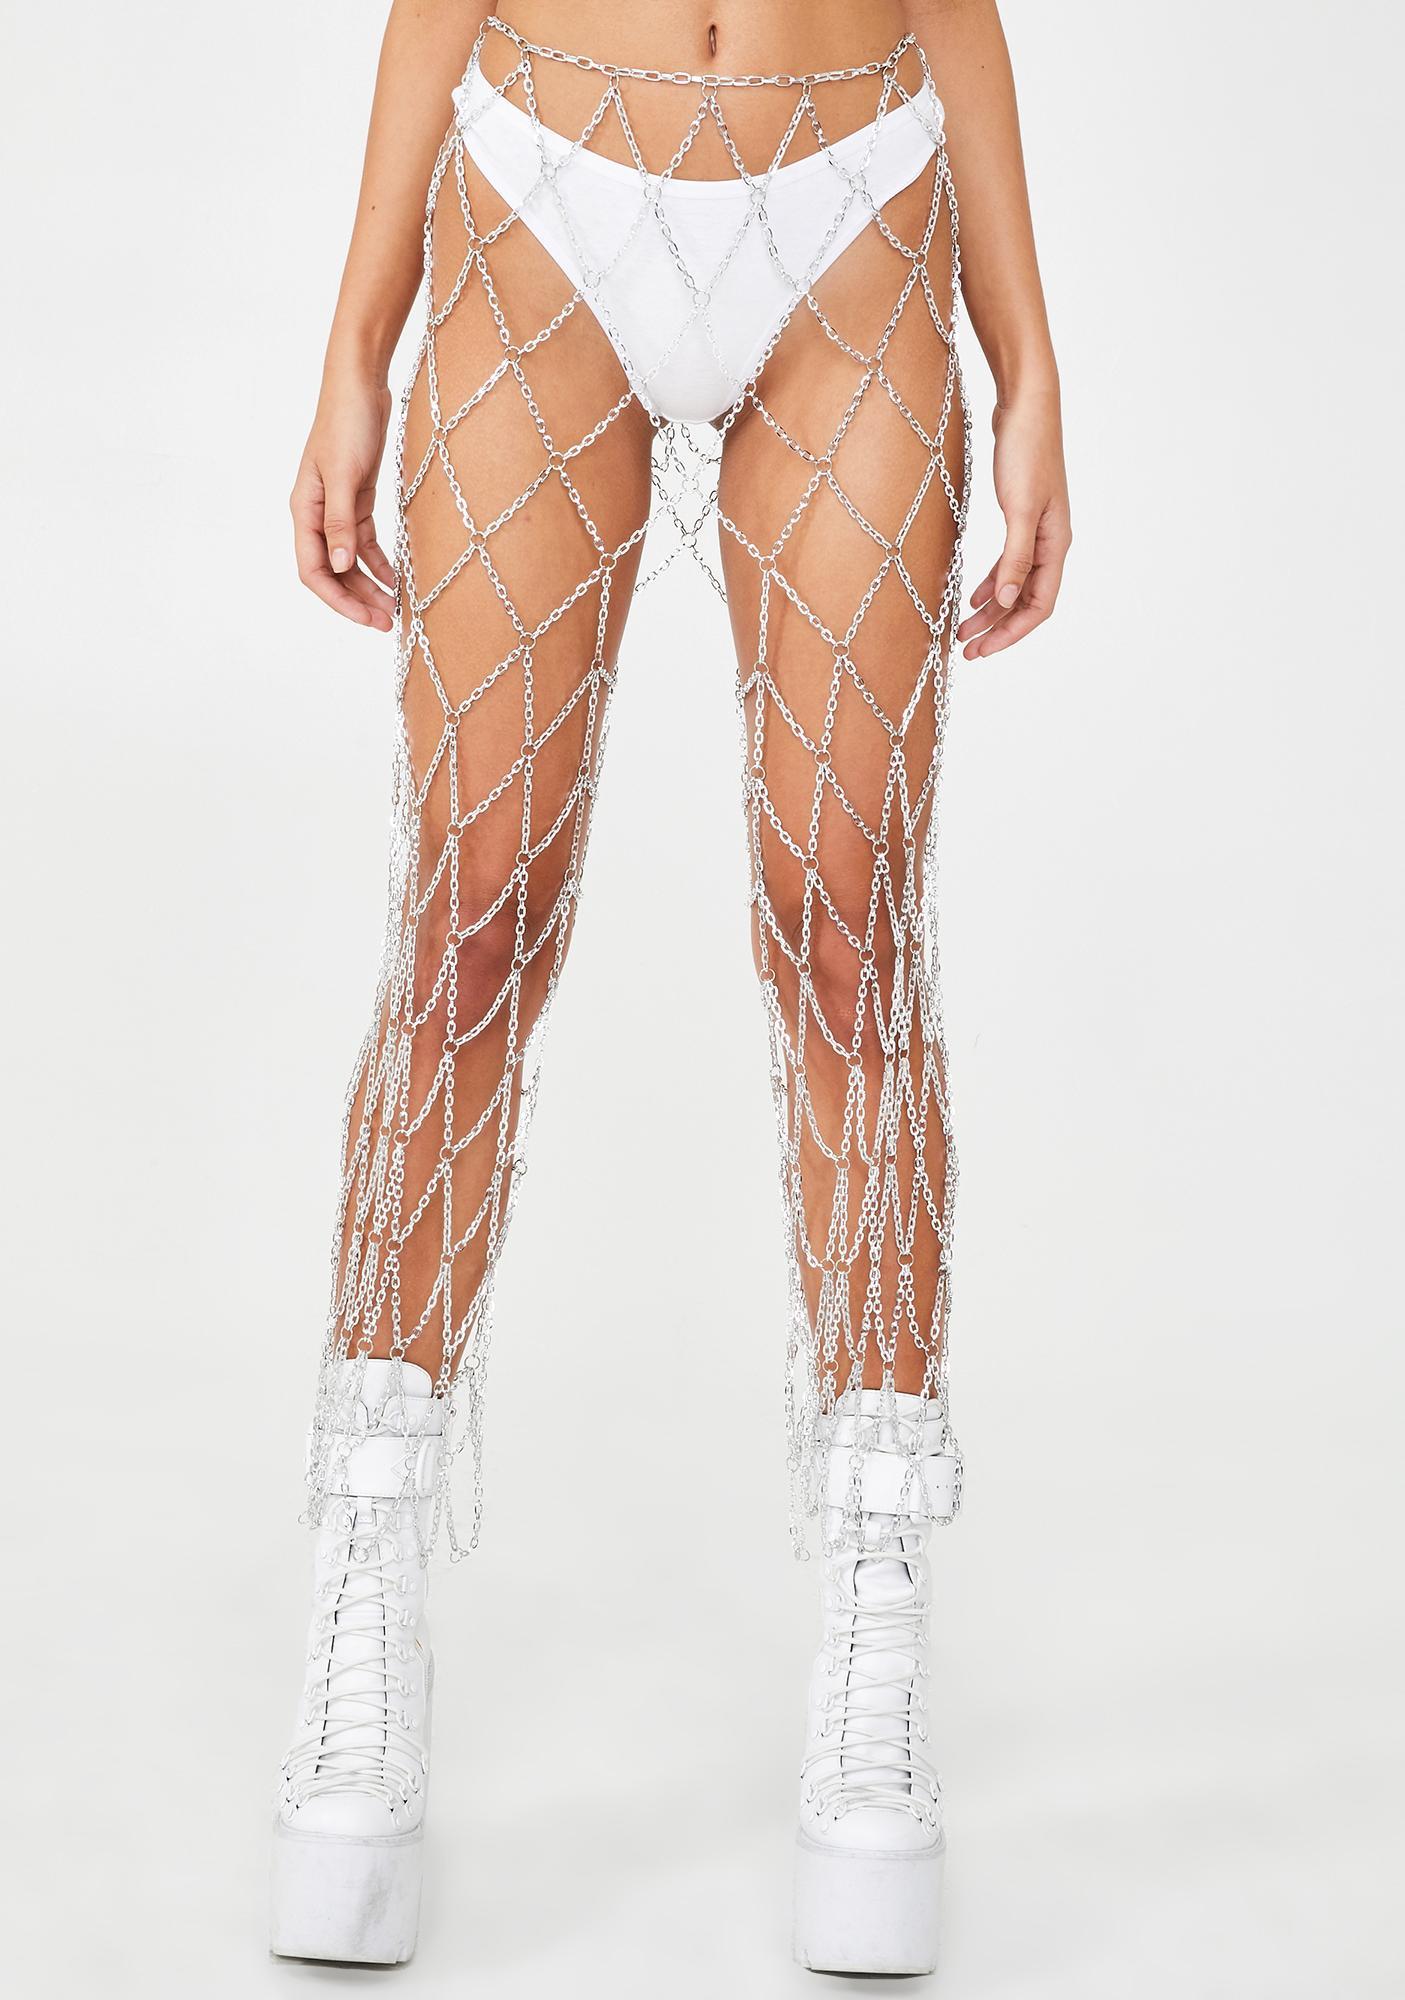 Desert Vibe Chain Pants